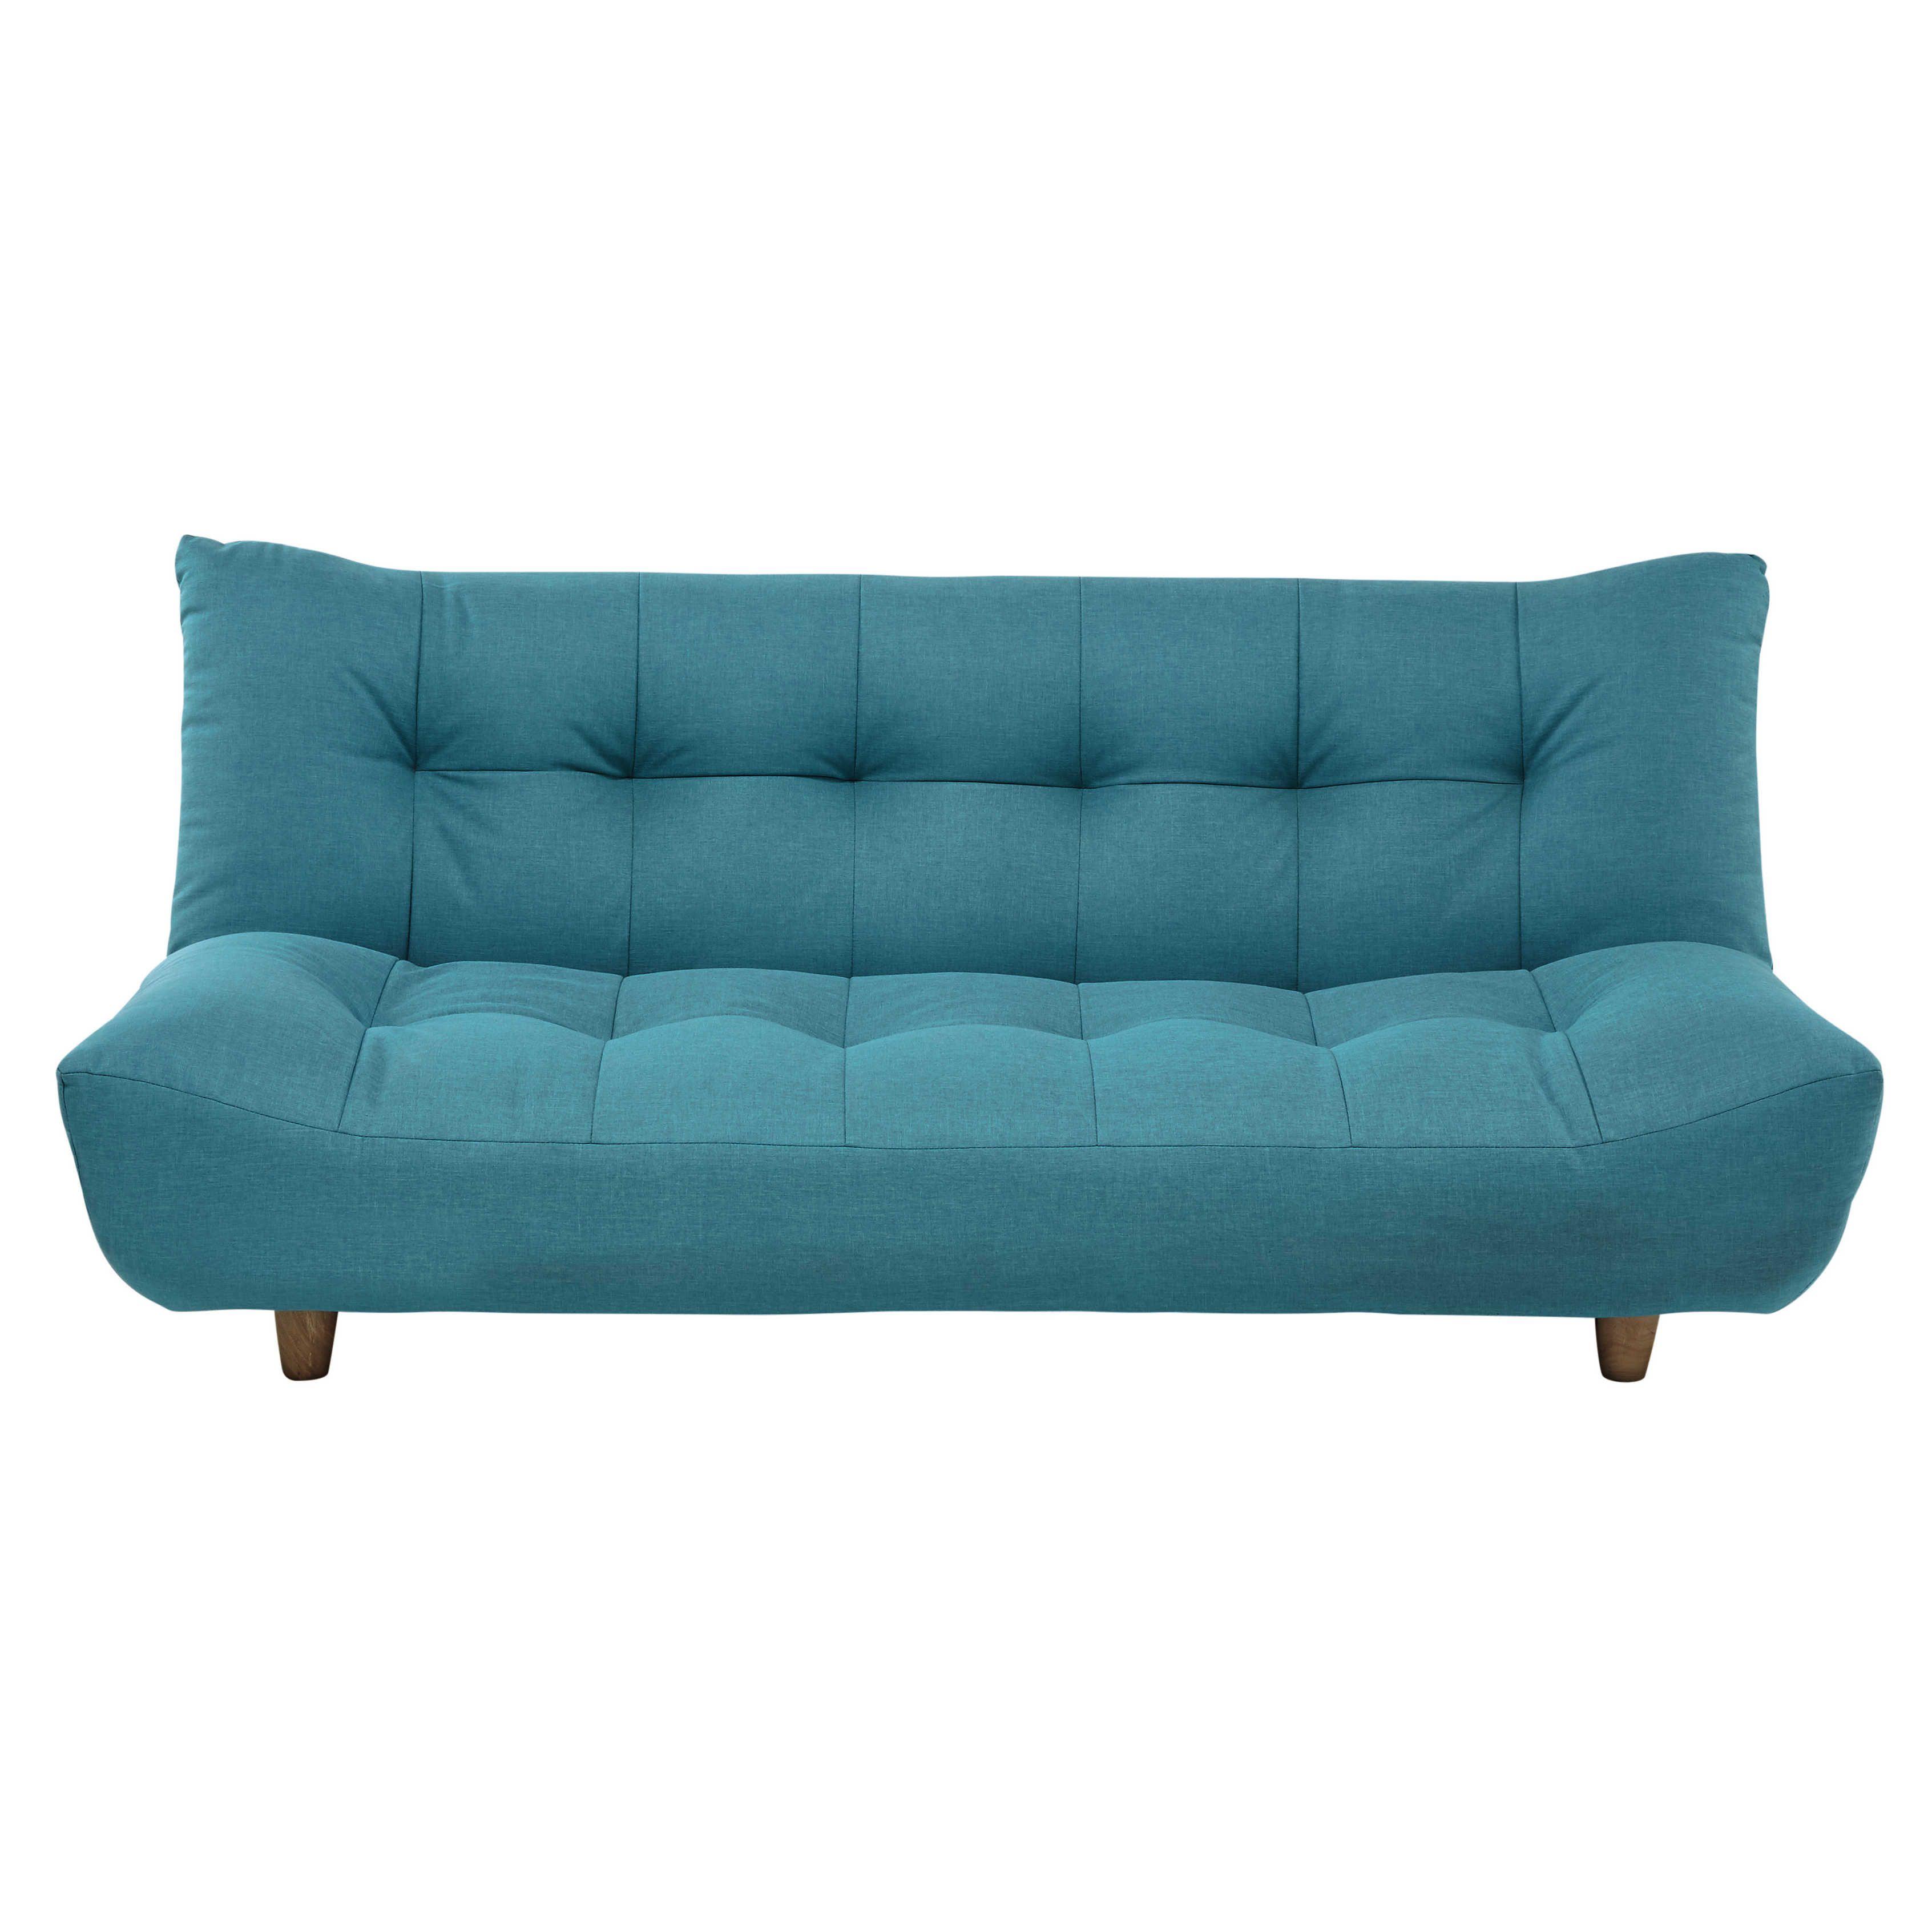 Divano Trasformabile Azzurro Turchese 3 Posti Sofa Bedssofa Sofasmall